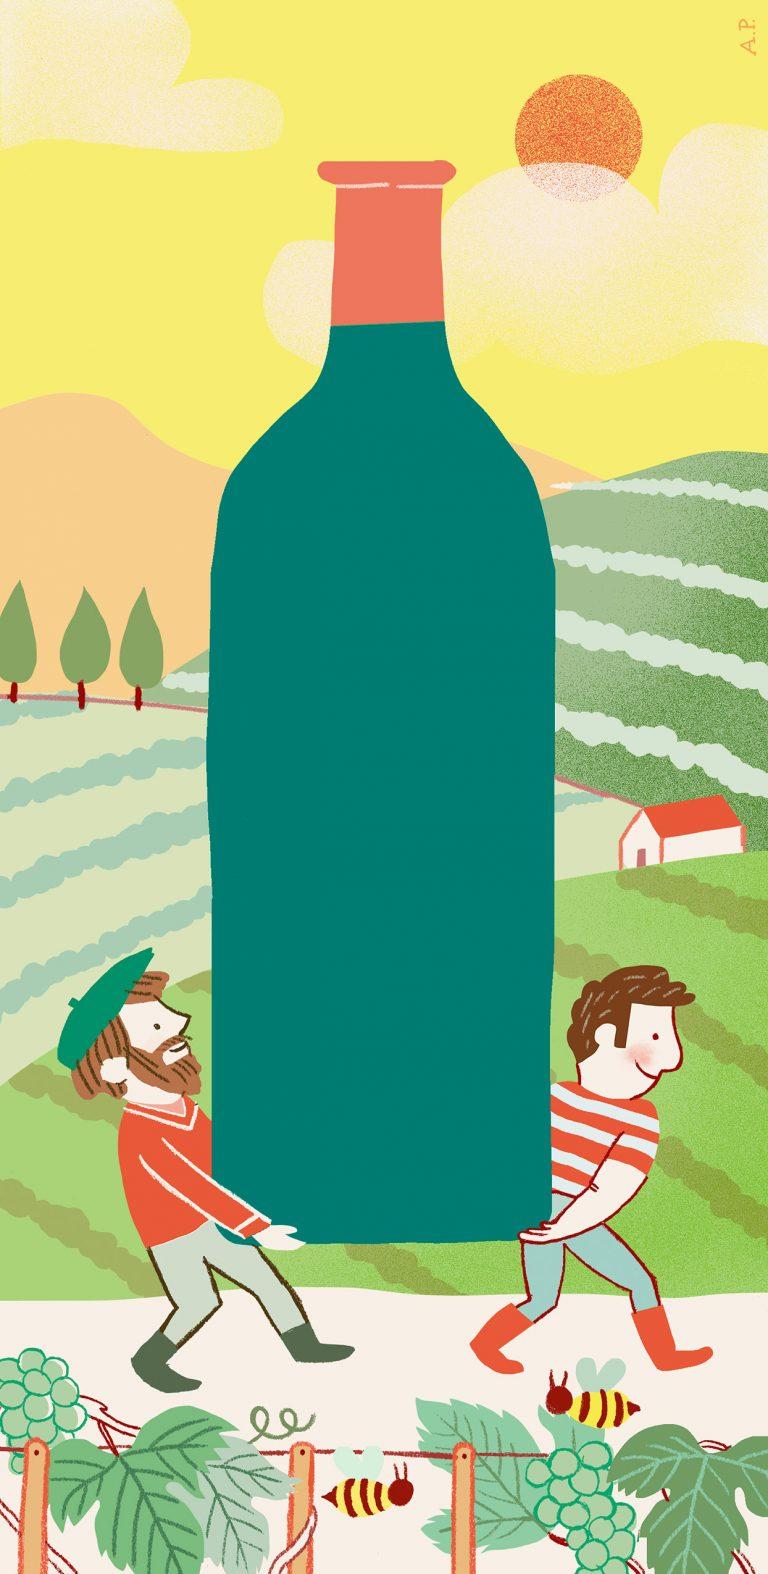 Annalisa Papagna illustration - Arte del vino